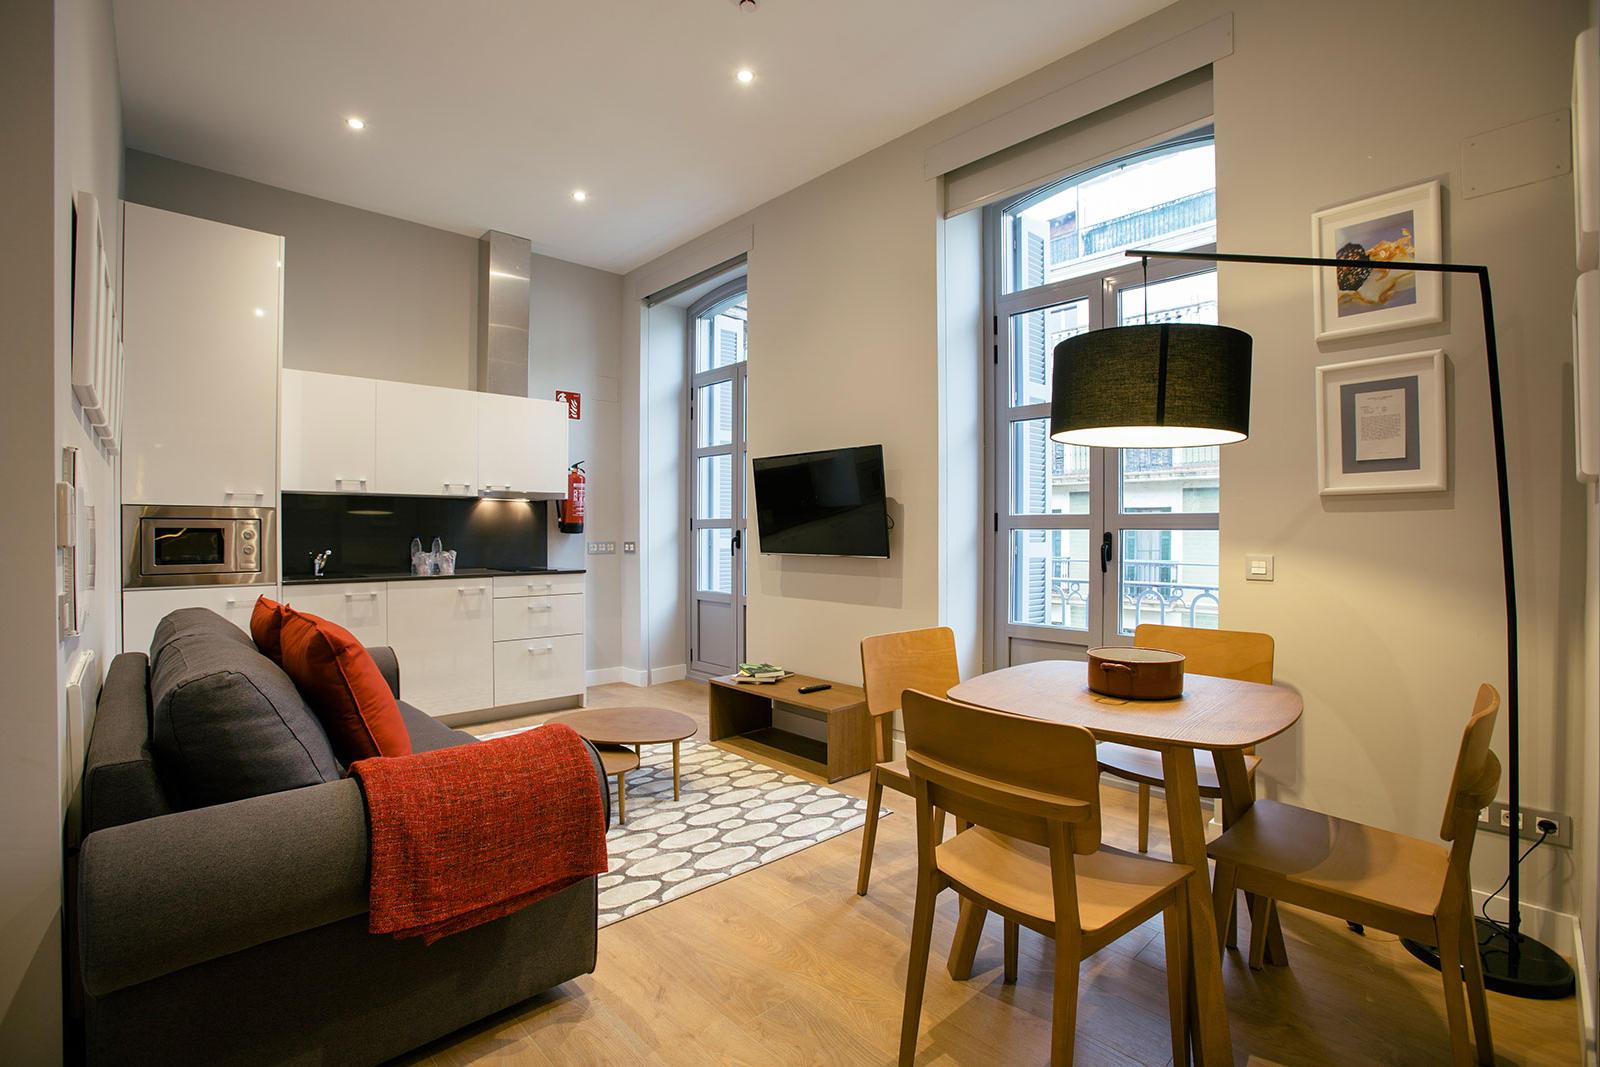 Exterior Studio Suite Hotel Donostia-San Sebastián Legazpidoce 001